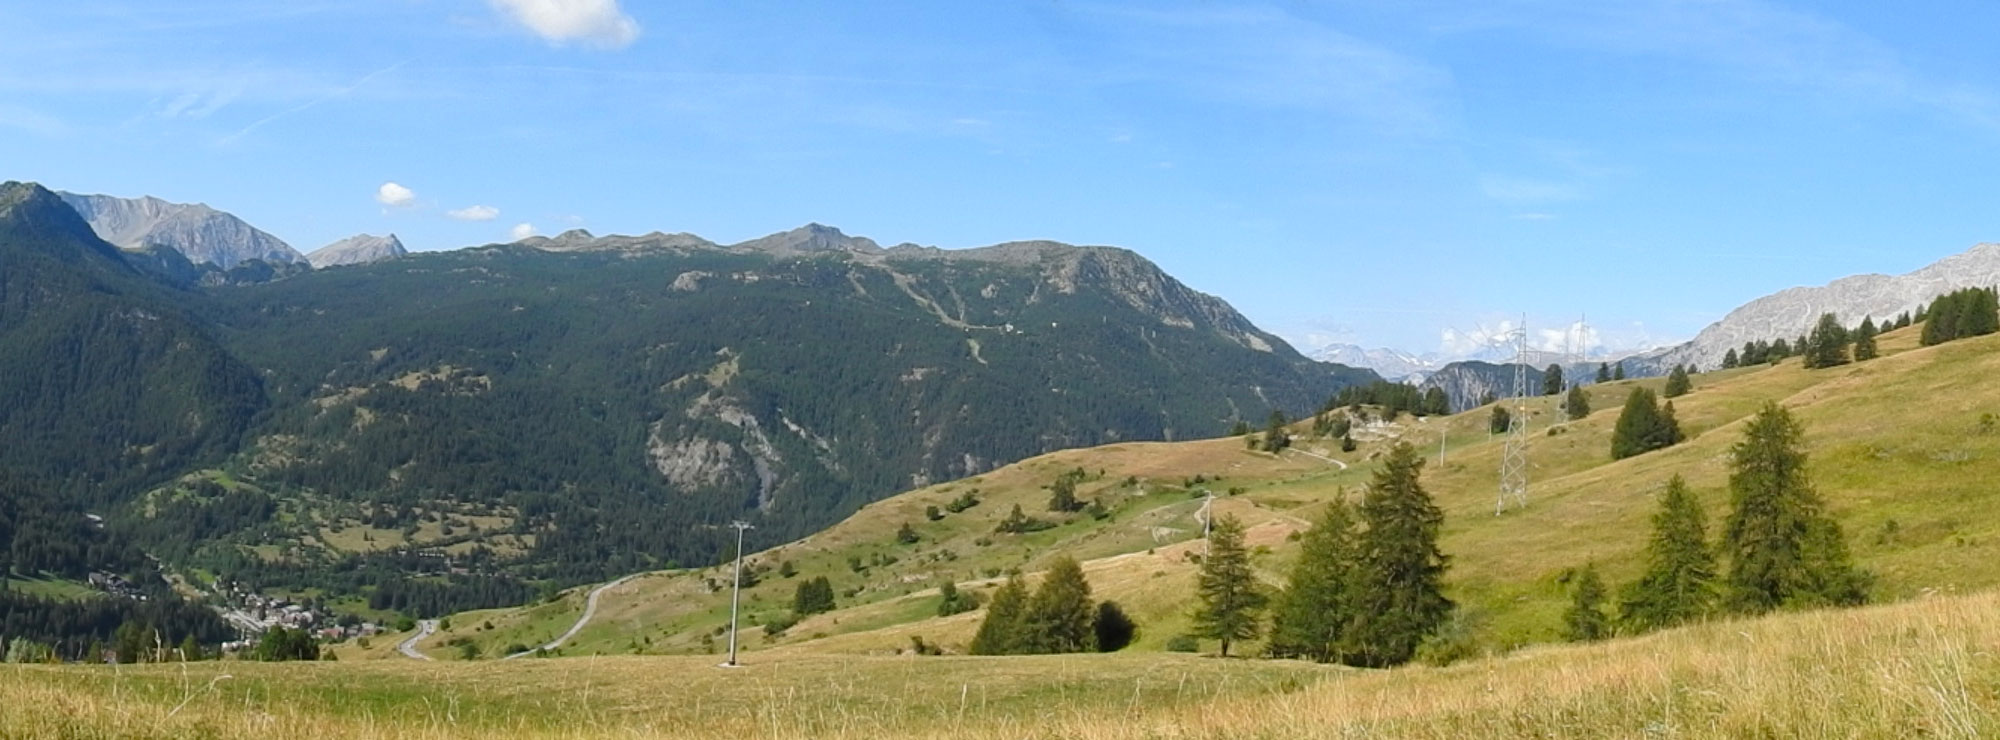 Slider GPSO - Panorama